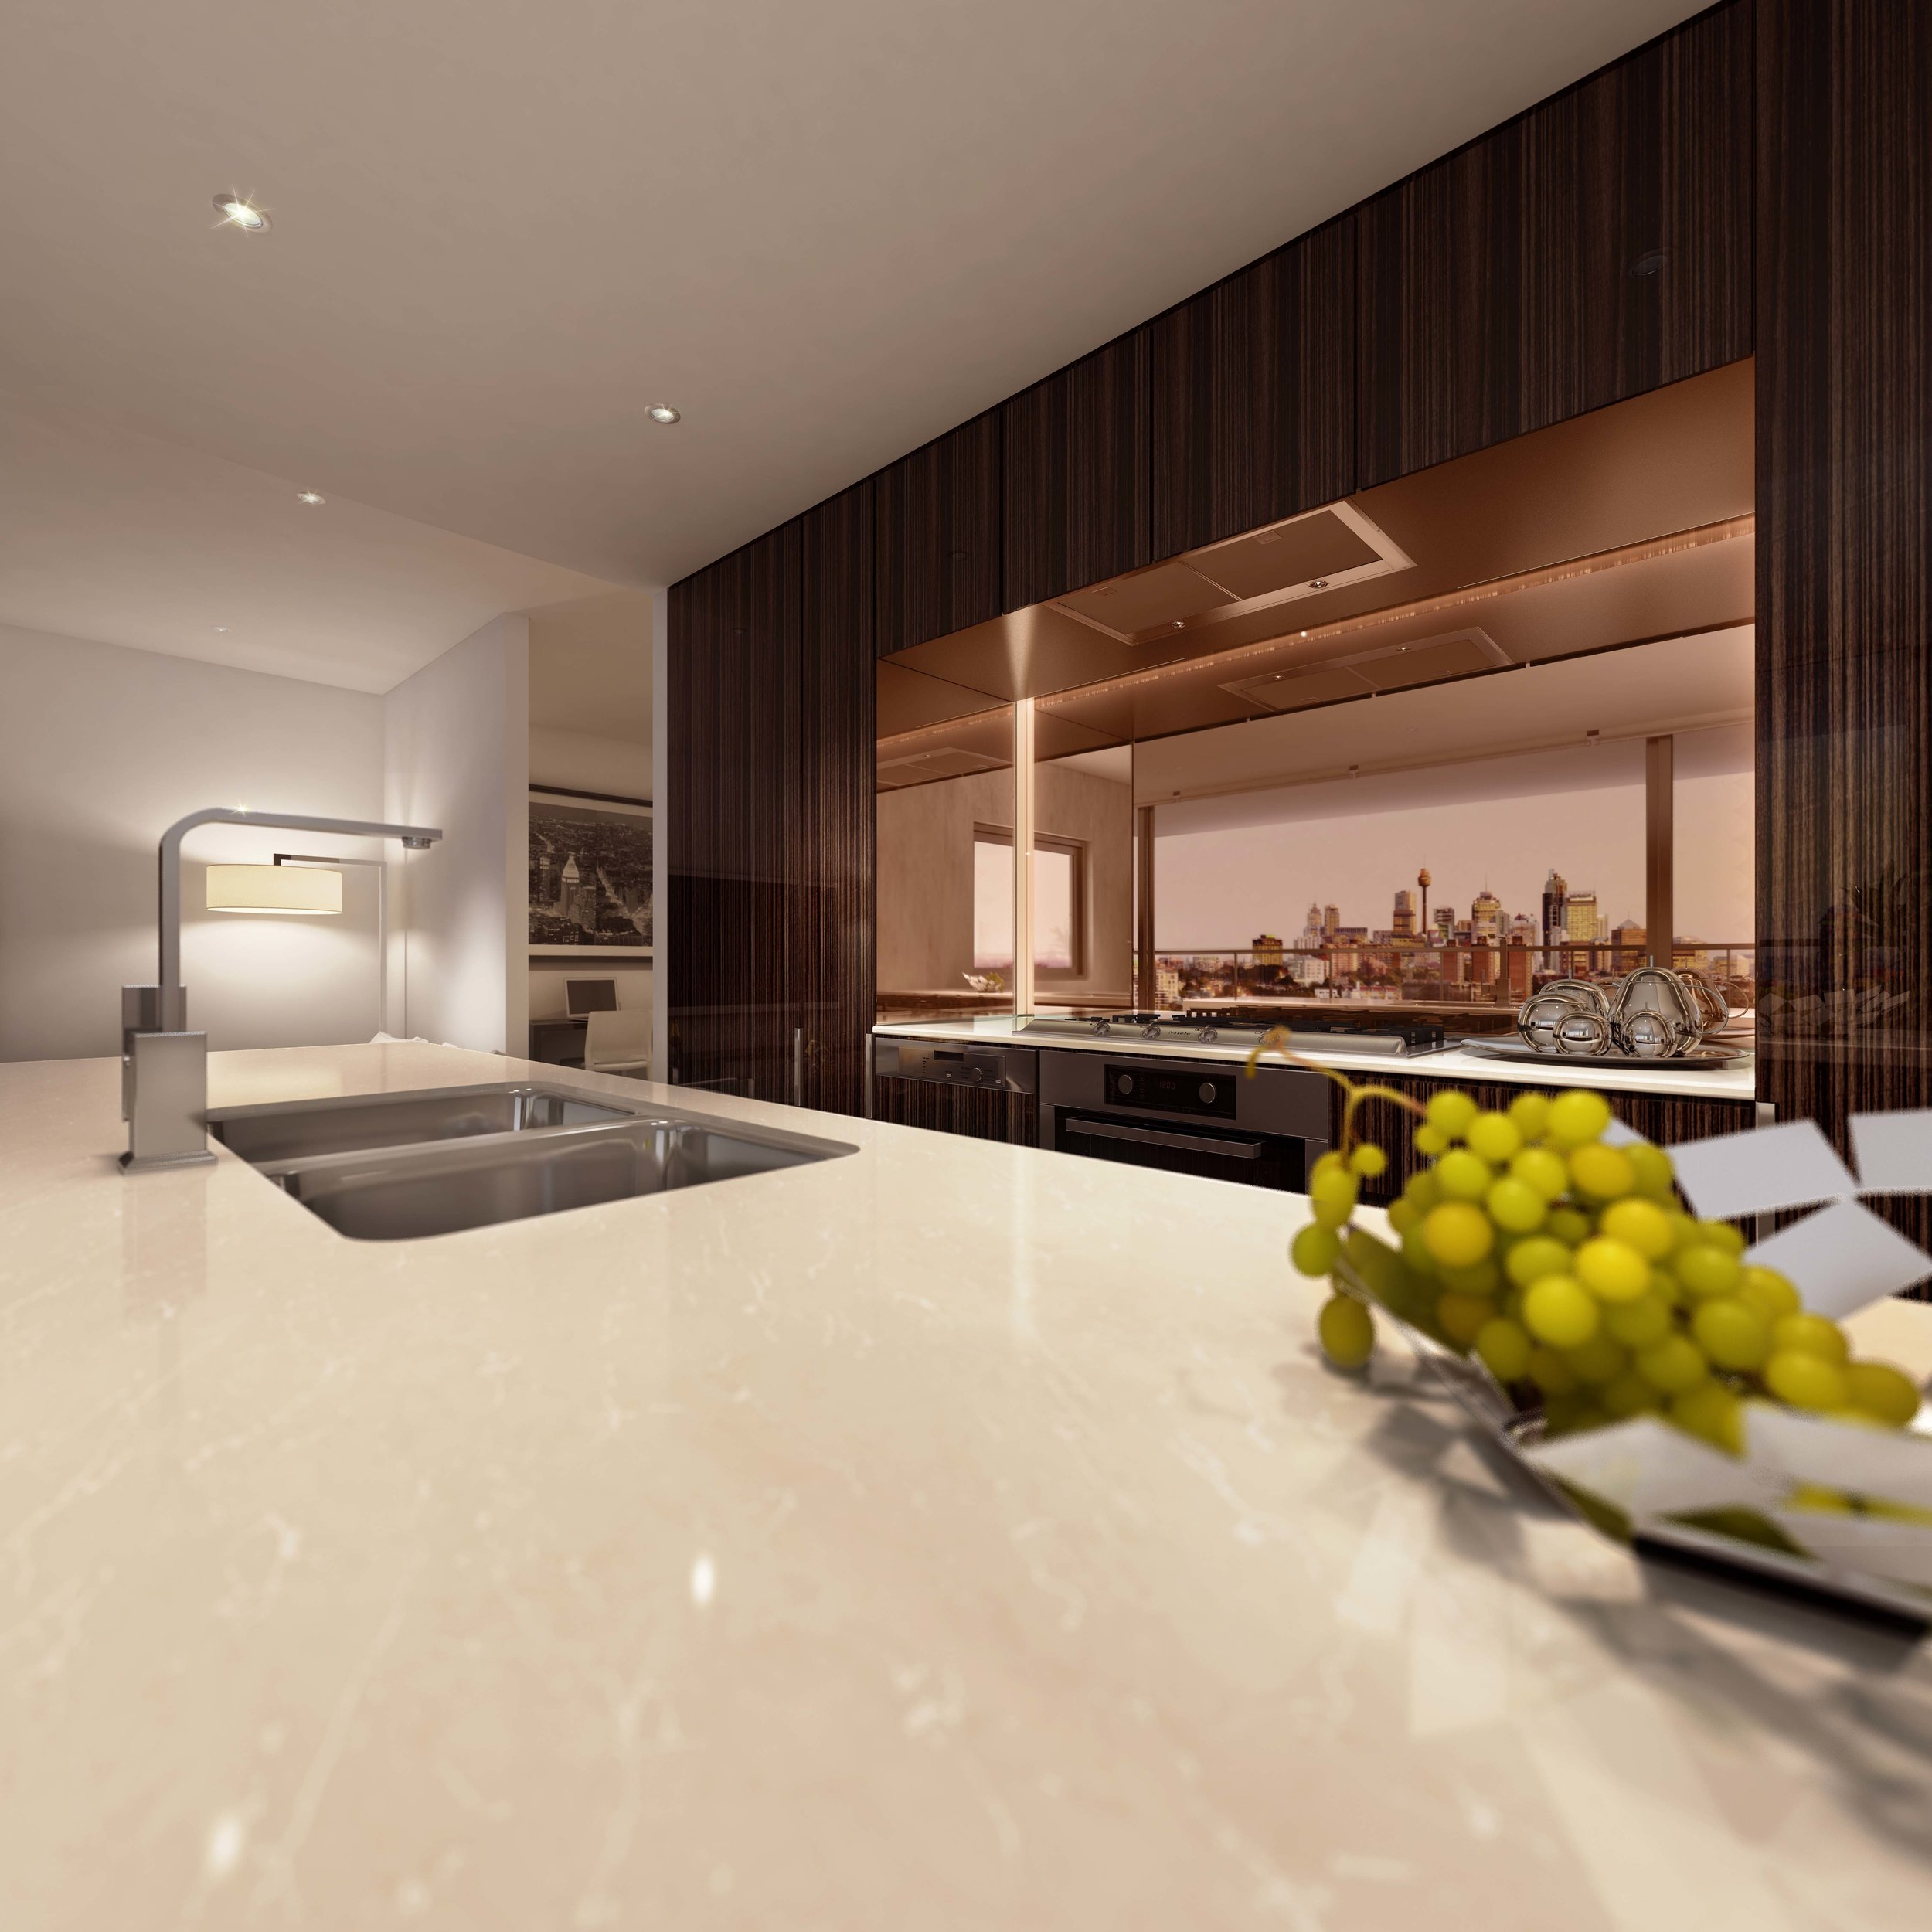 2 Bedroom - Kitchen 3 - Ebony.jpg